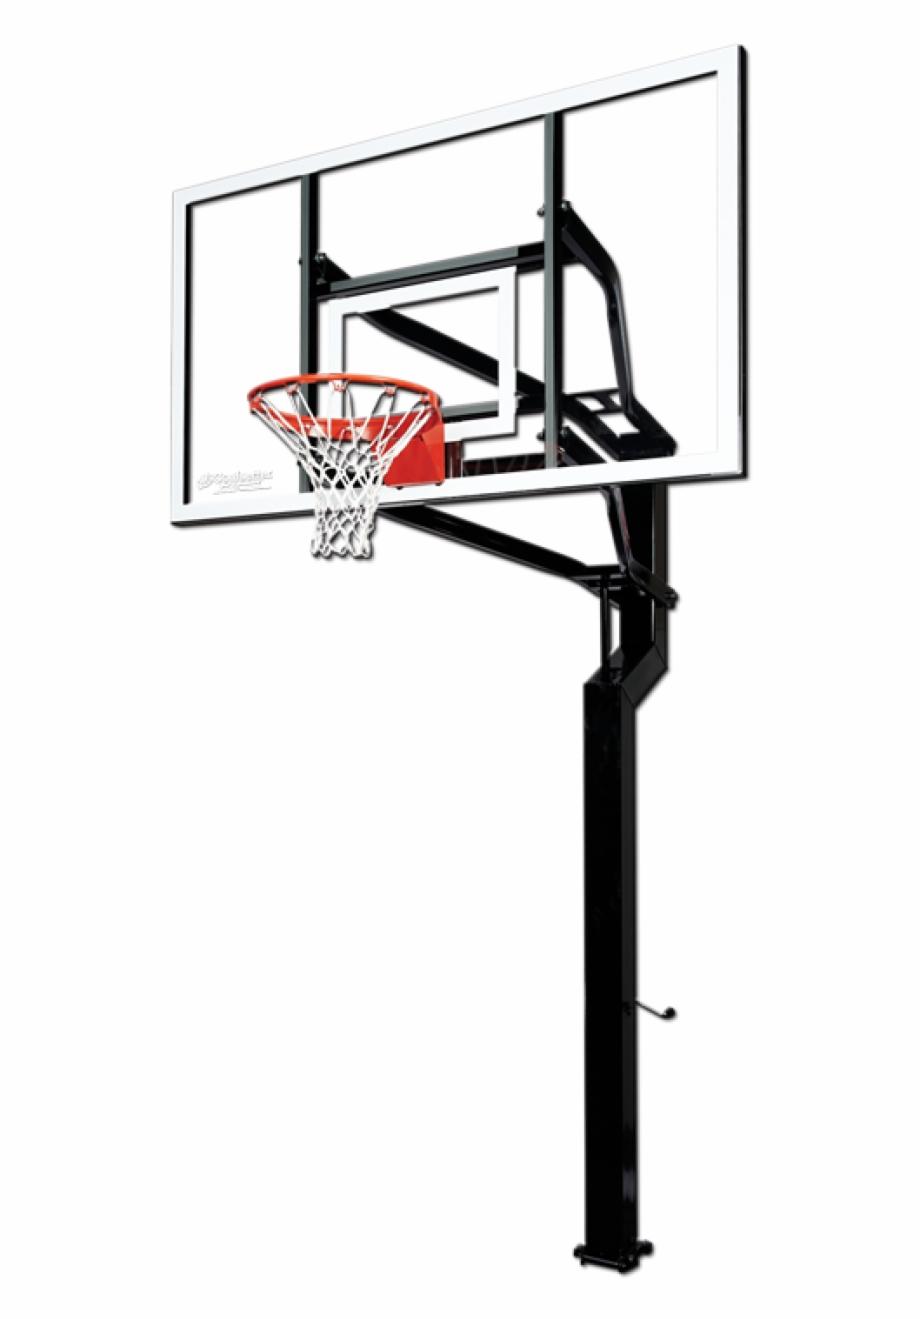 Nba Basketball Hoop Png Plusp.